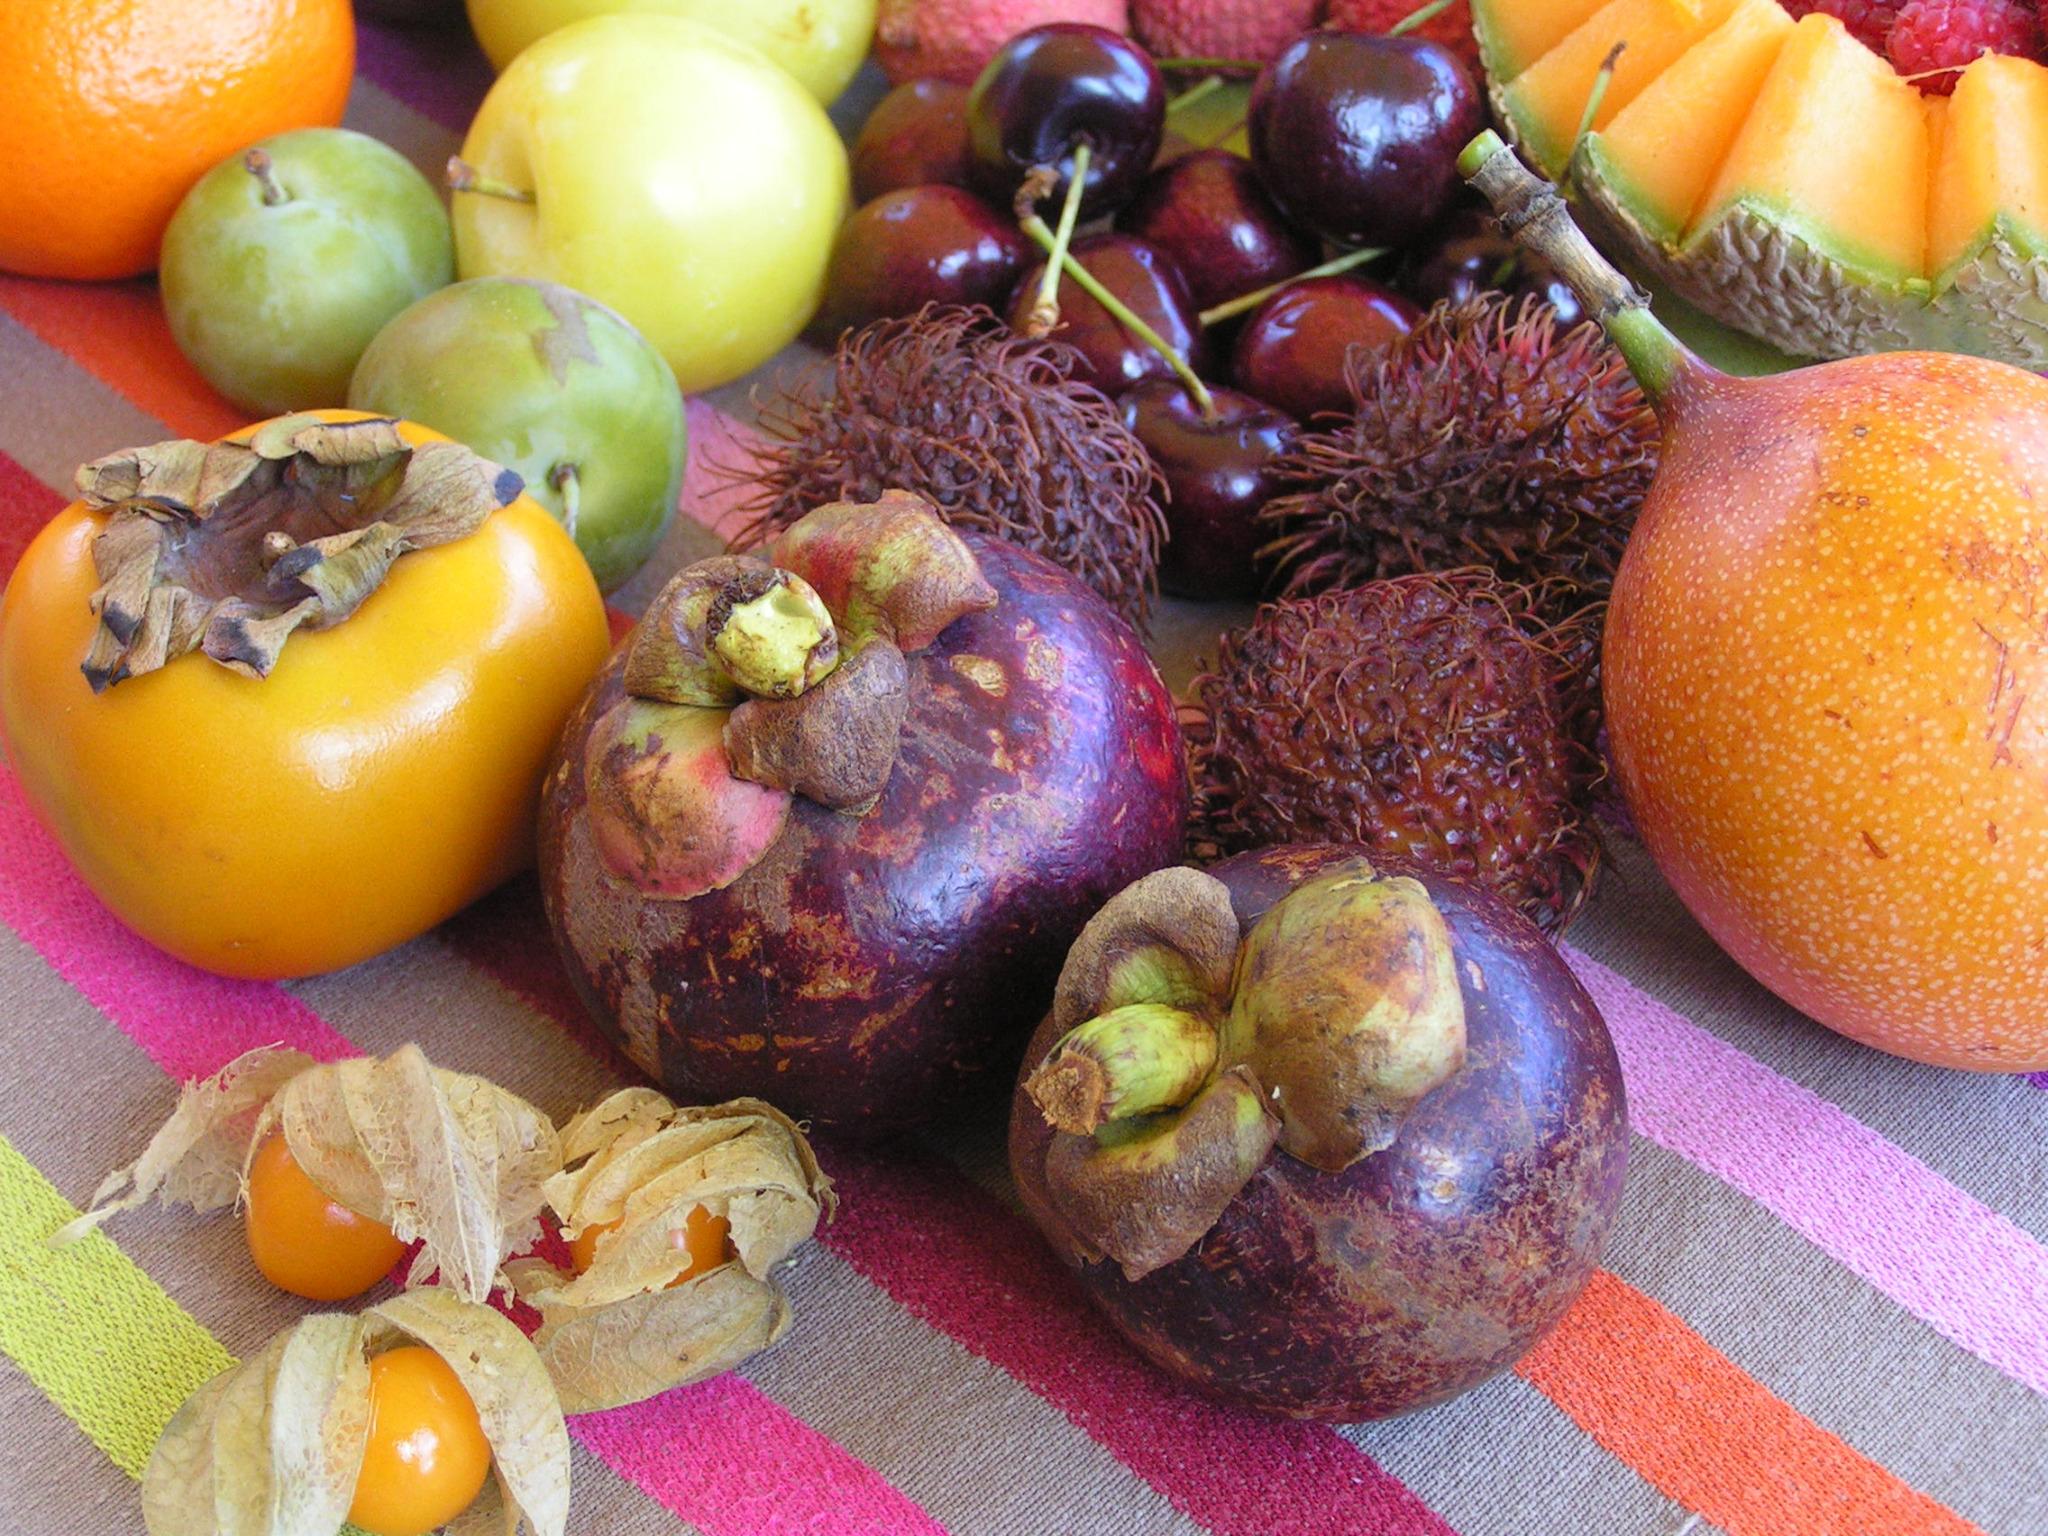 J-20 * Merveilleux fruits exotiques